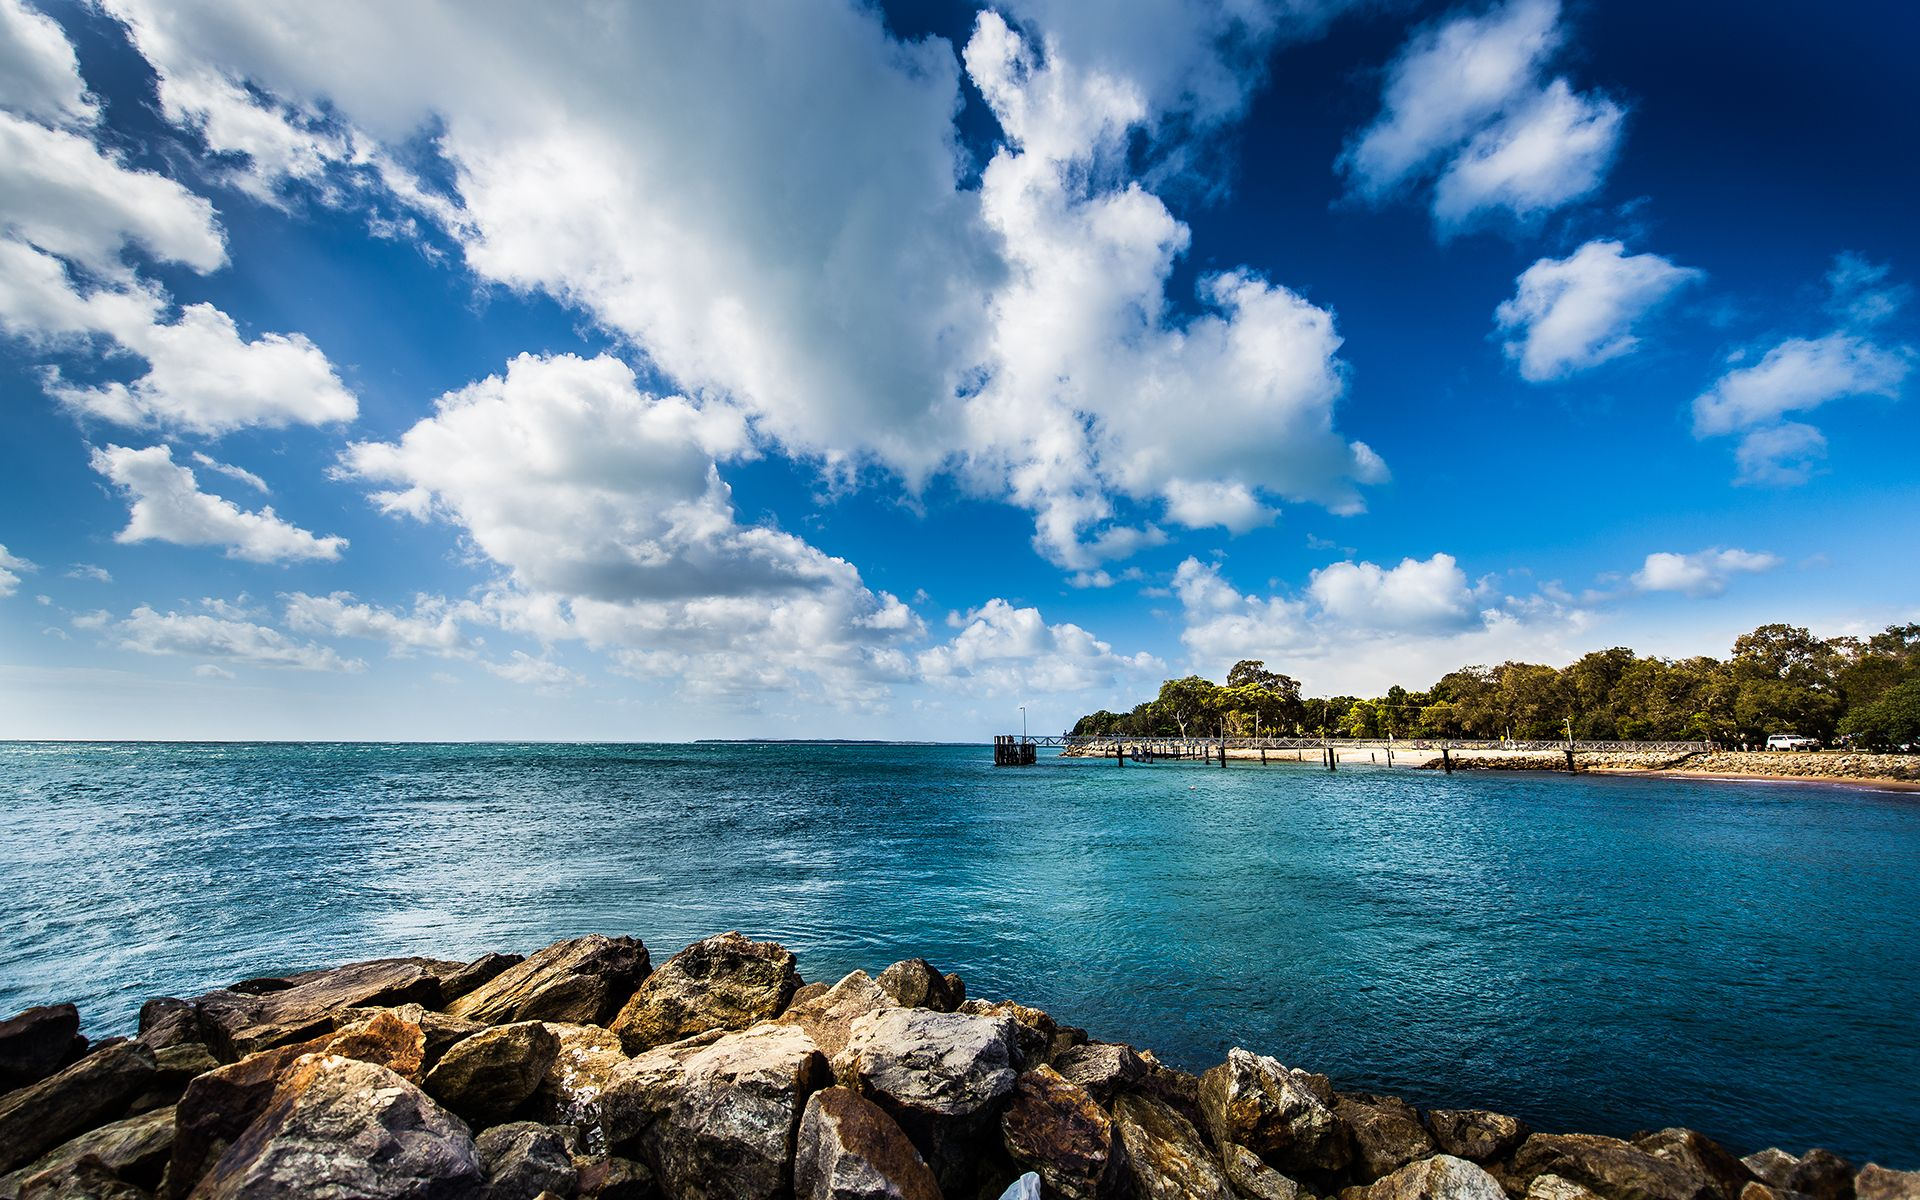 Scenery Landscapes And Seascapes Landscape Nature Seascape Ocean Sea Rocks Shore Coast Water Trees Ocean Wallpaper Ocean Landscape Scenery Wallpaper